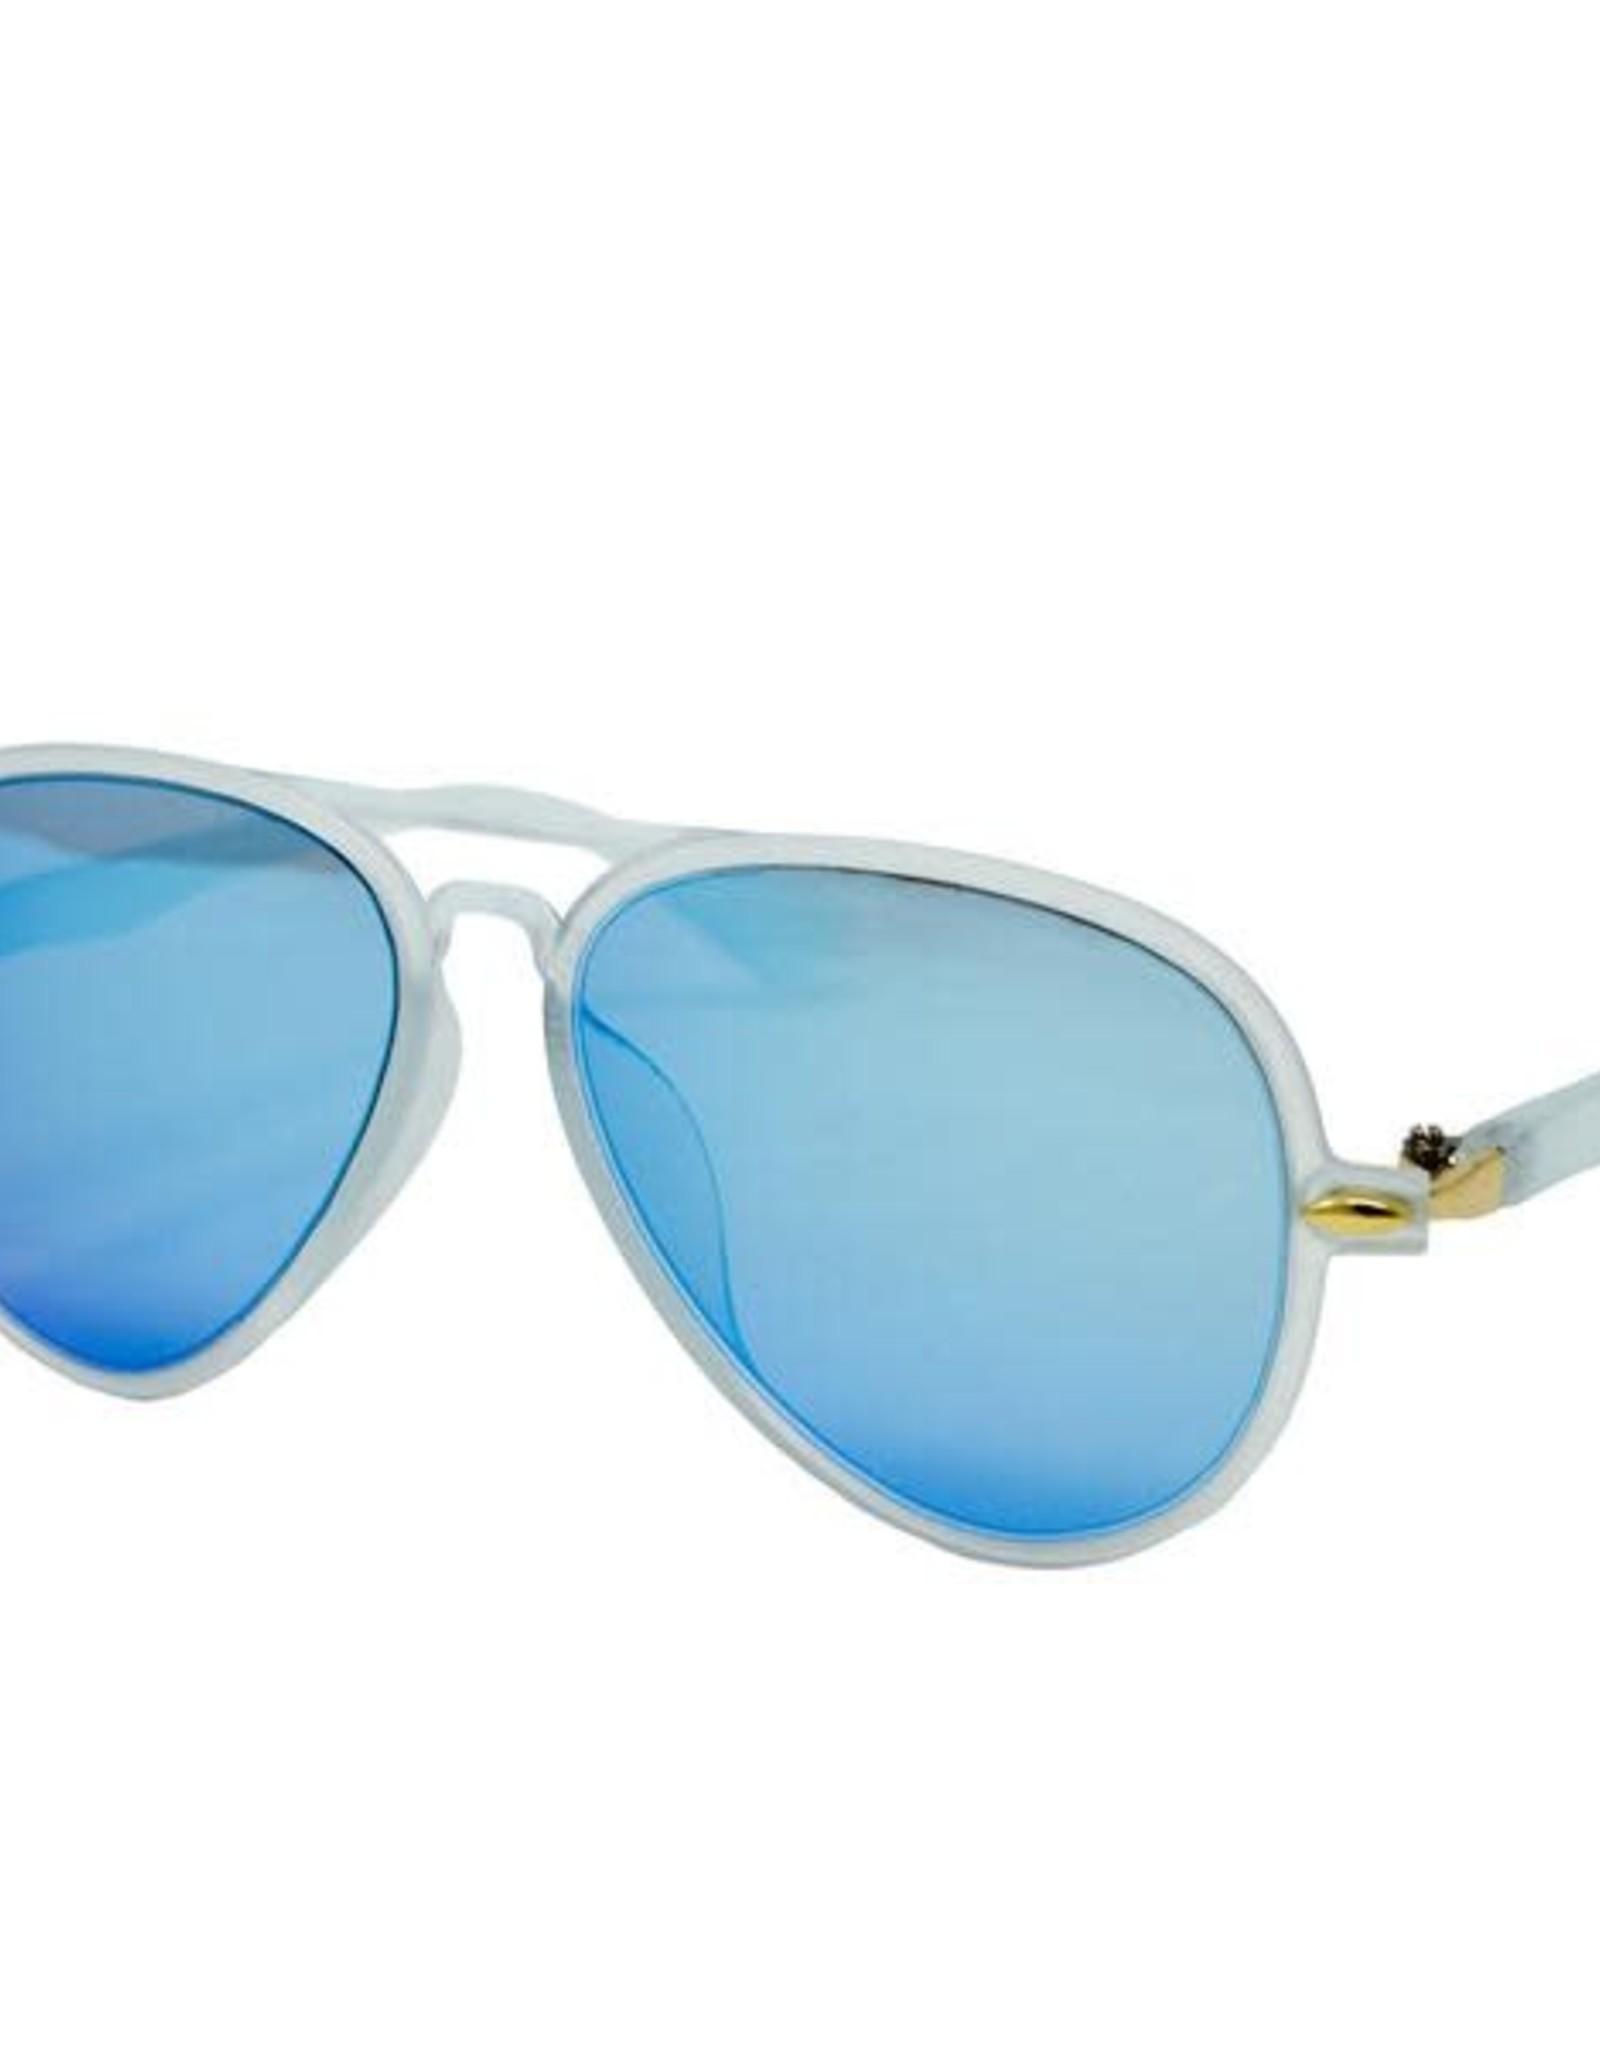 Zomi Gems Cool Blue Aviator Sunglasses